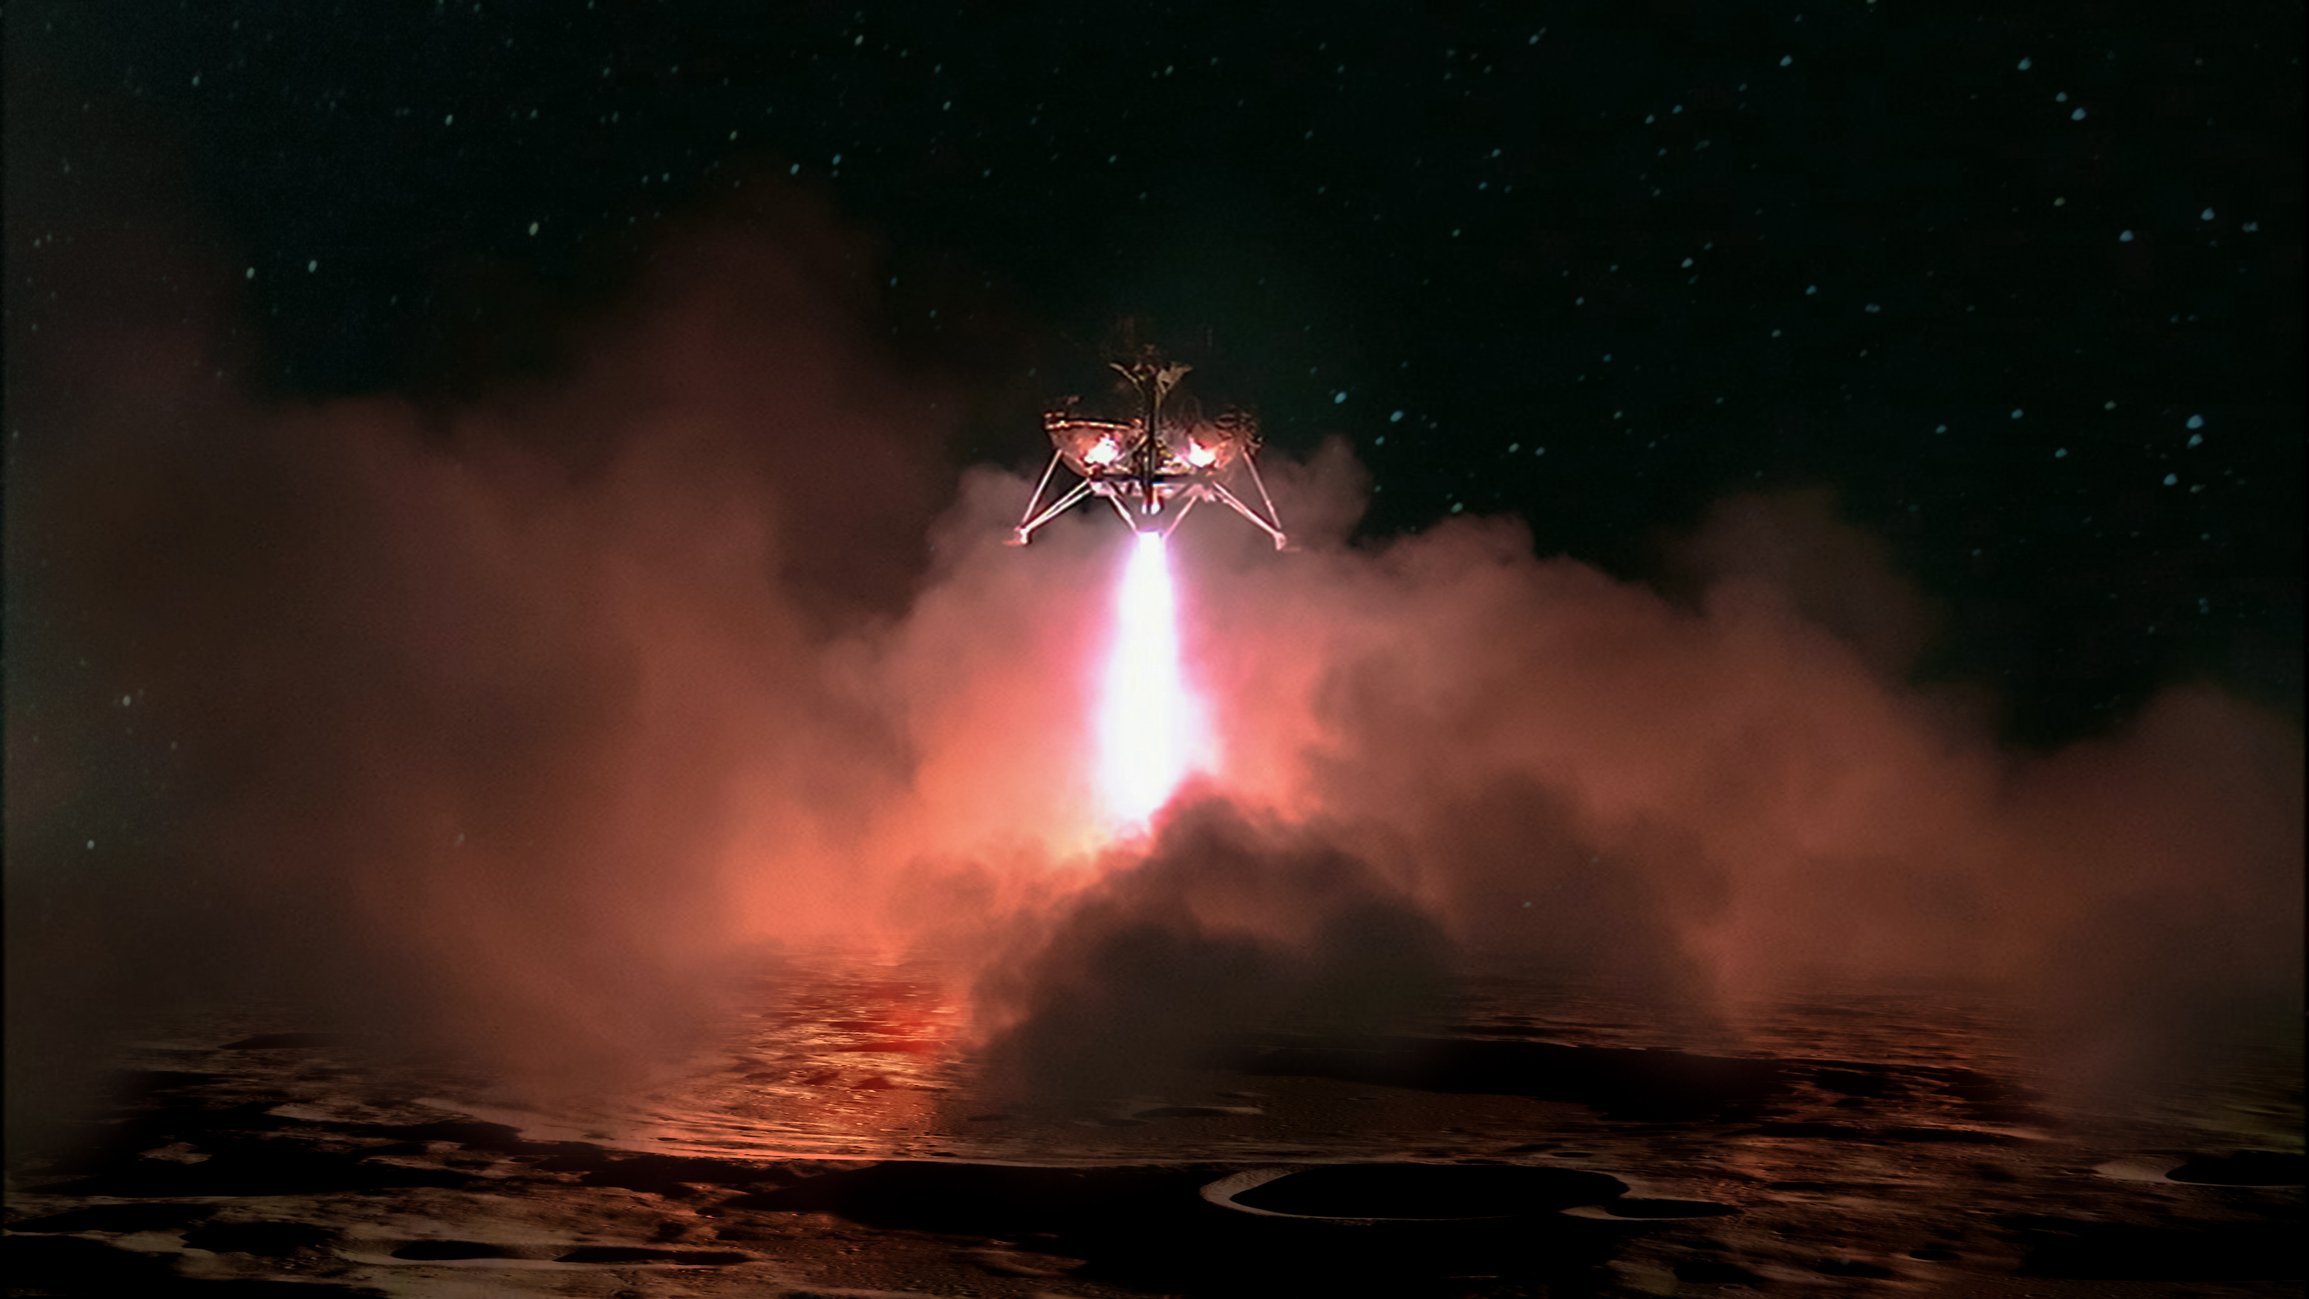 William Shatner Has Landed!